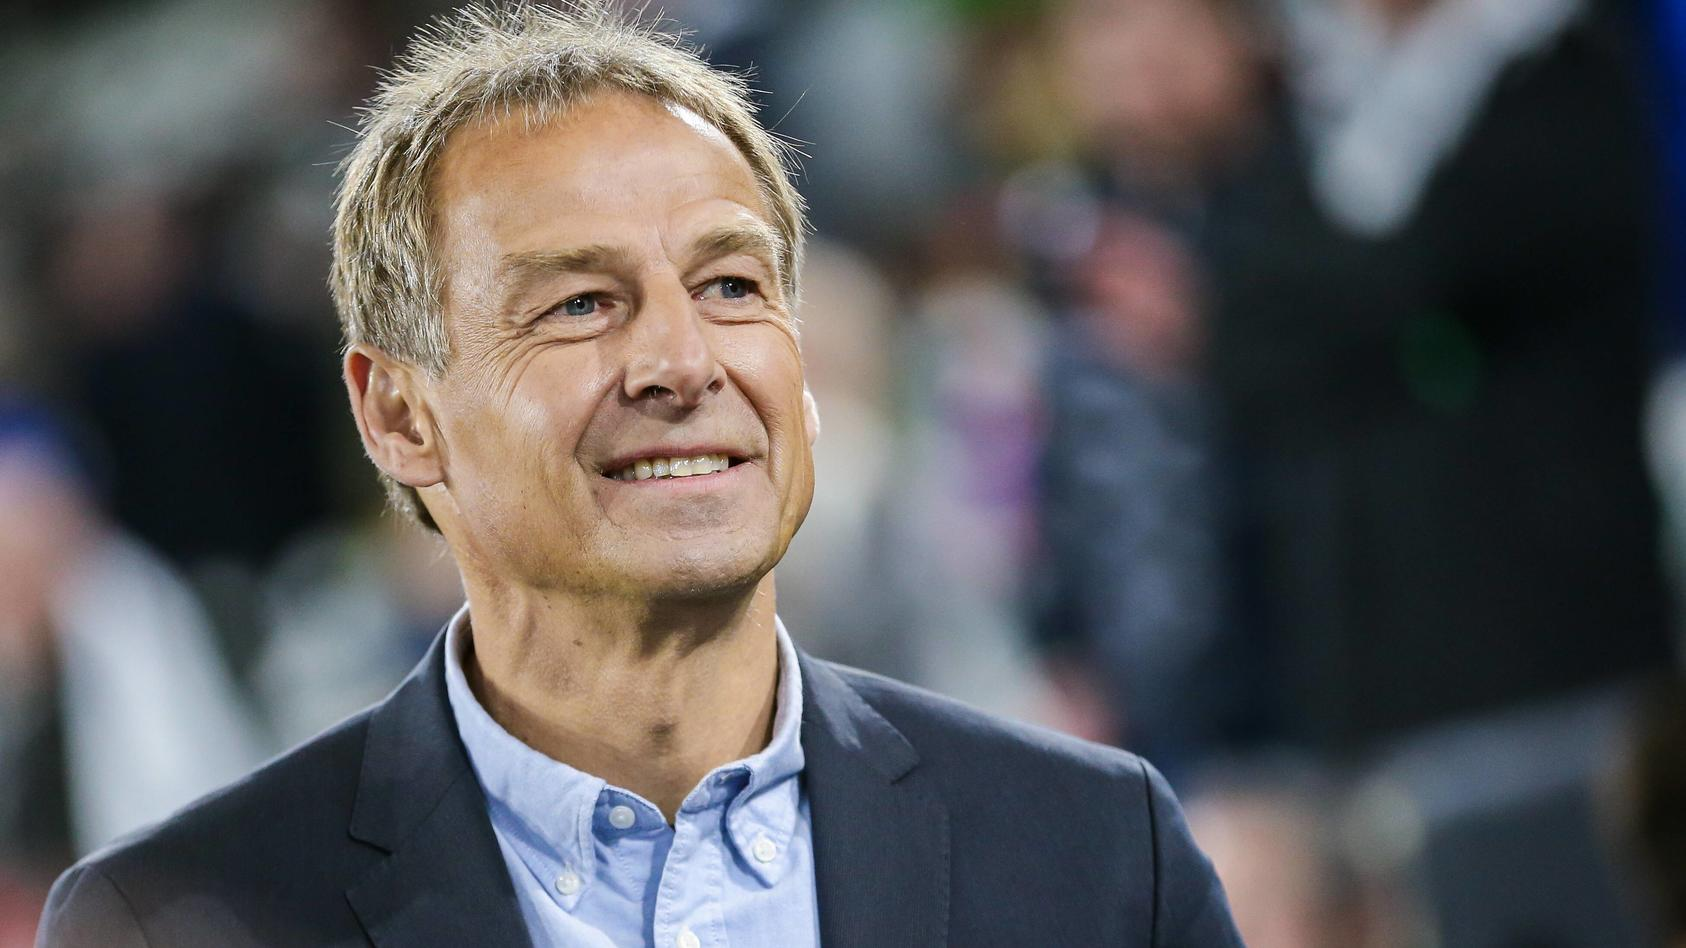 Juergen Klinsmann TV Experte RTL ehemaliger Bundestrainer DFB regulations prohibit any use o